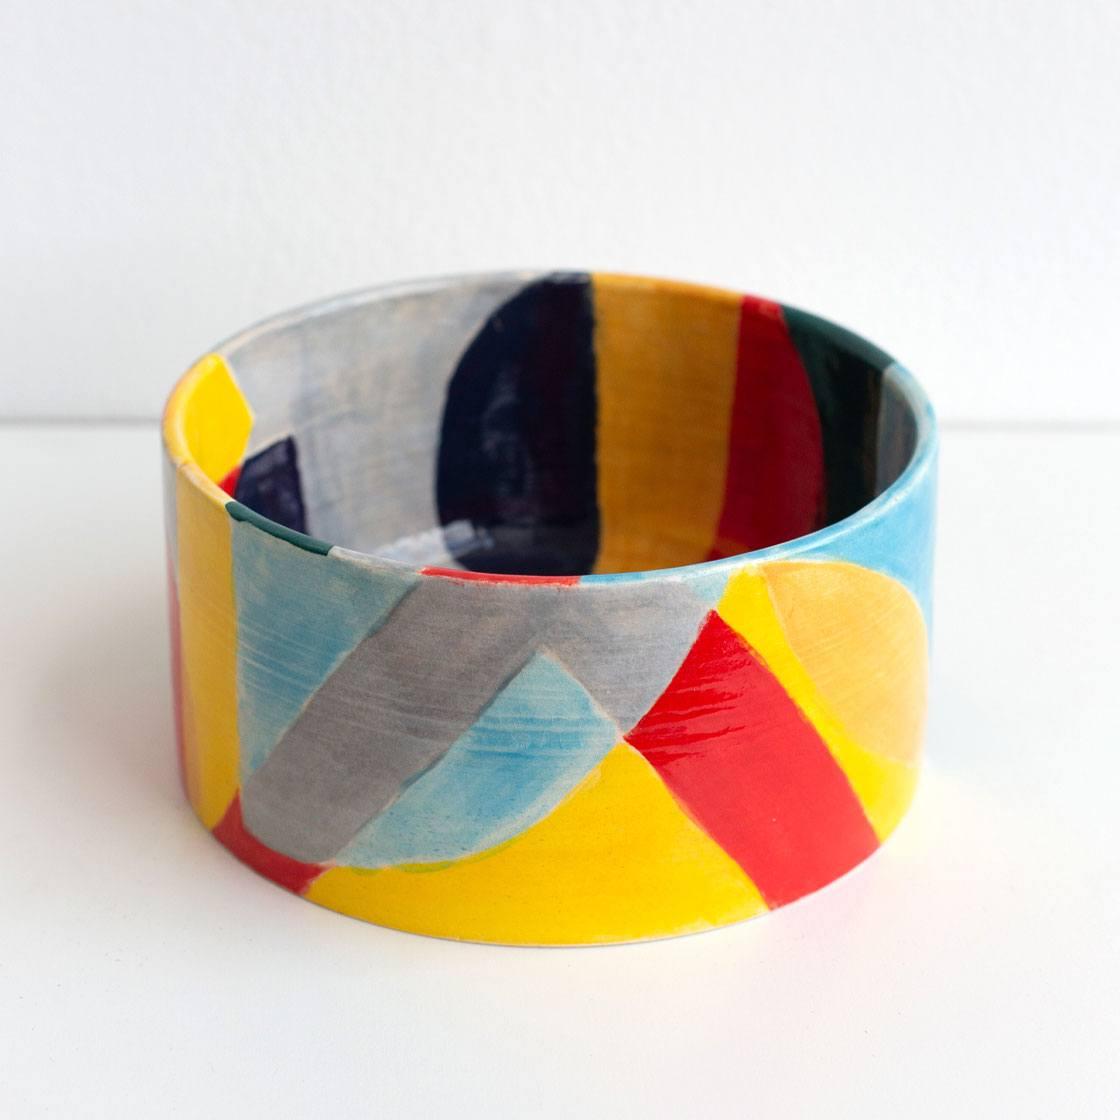 25th anniversary pattern ceramic bowl